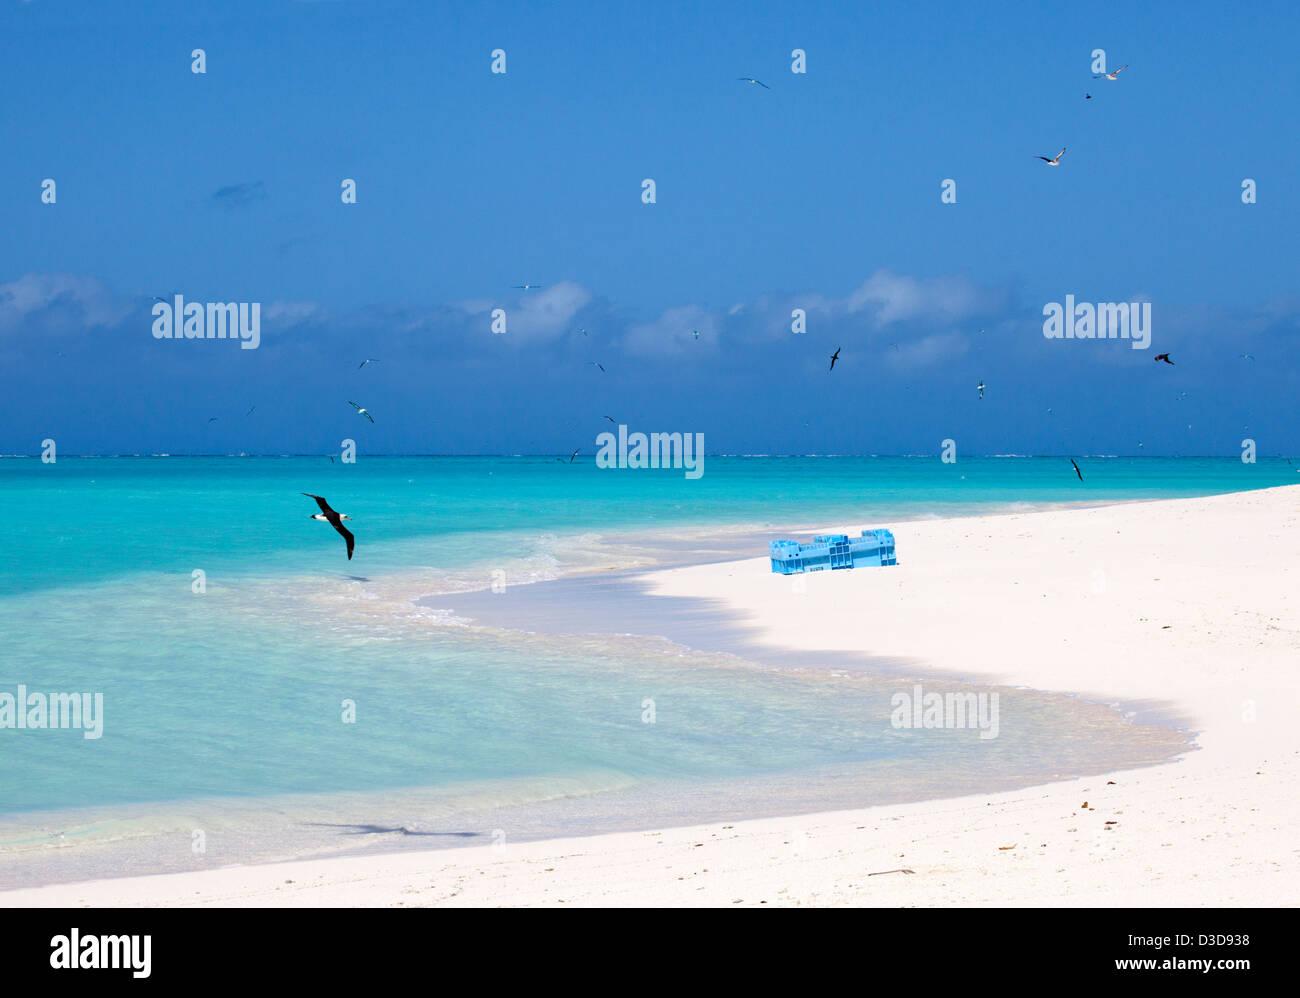 Laysan Albatross (Phoebastria immutabilis) flying over lagoon past plastic marine debris on the beach - Stock Image